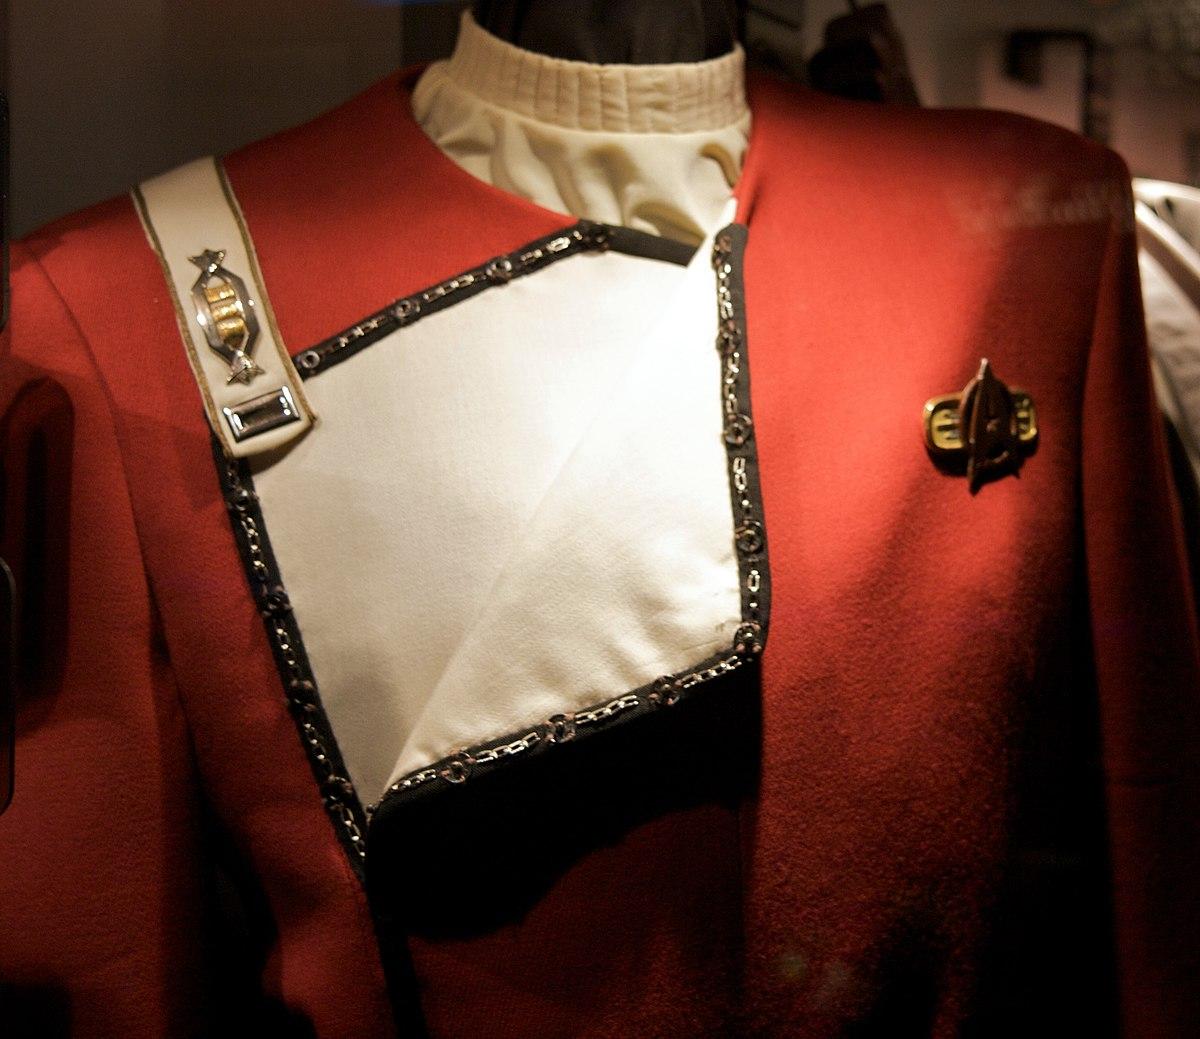 Star Trek Ii The Wrath Of Khan Wikiquote